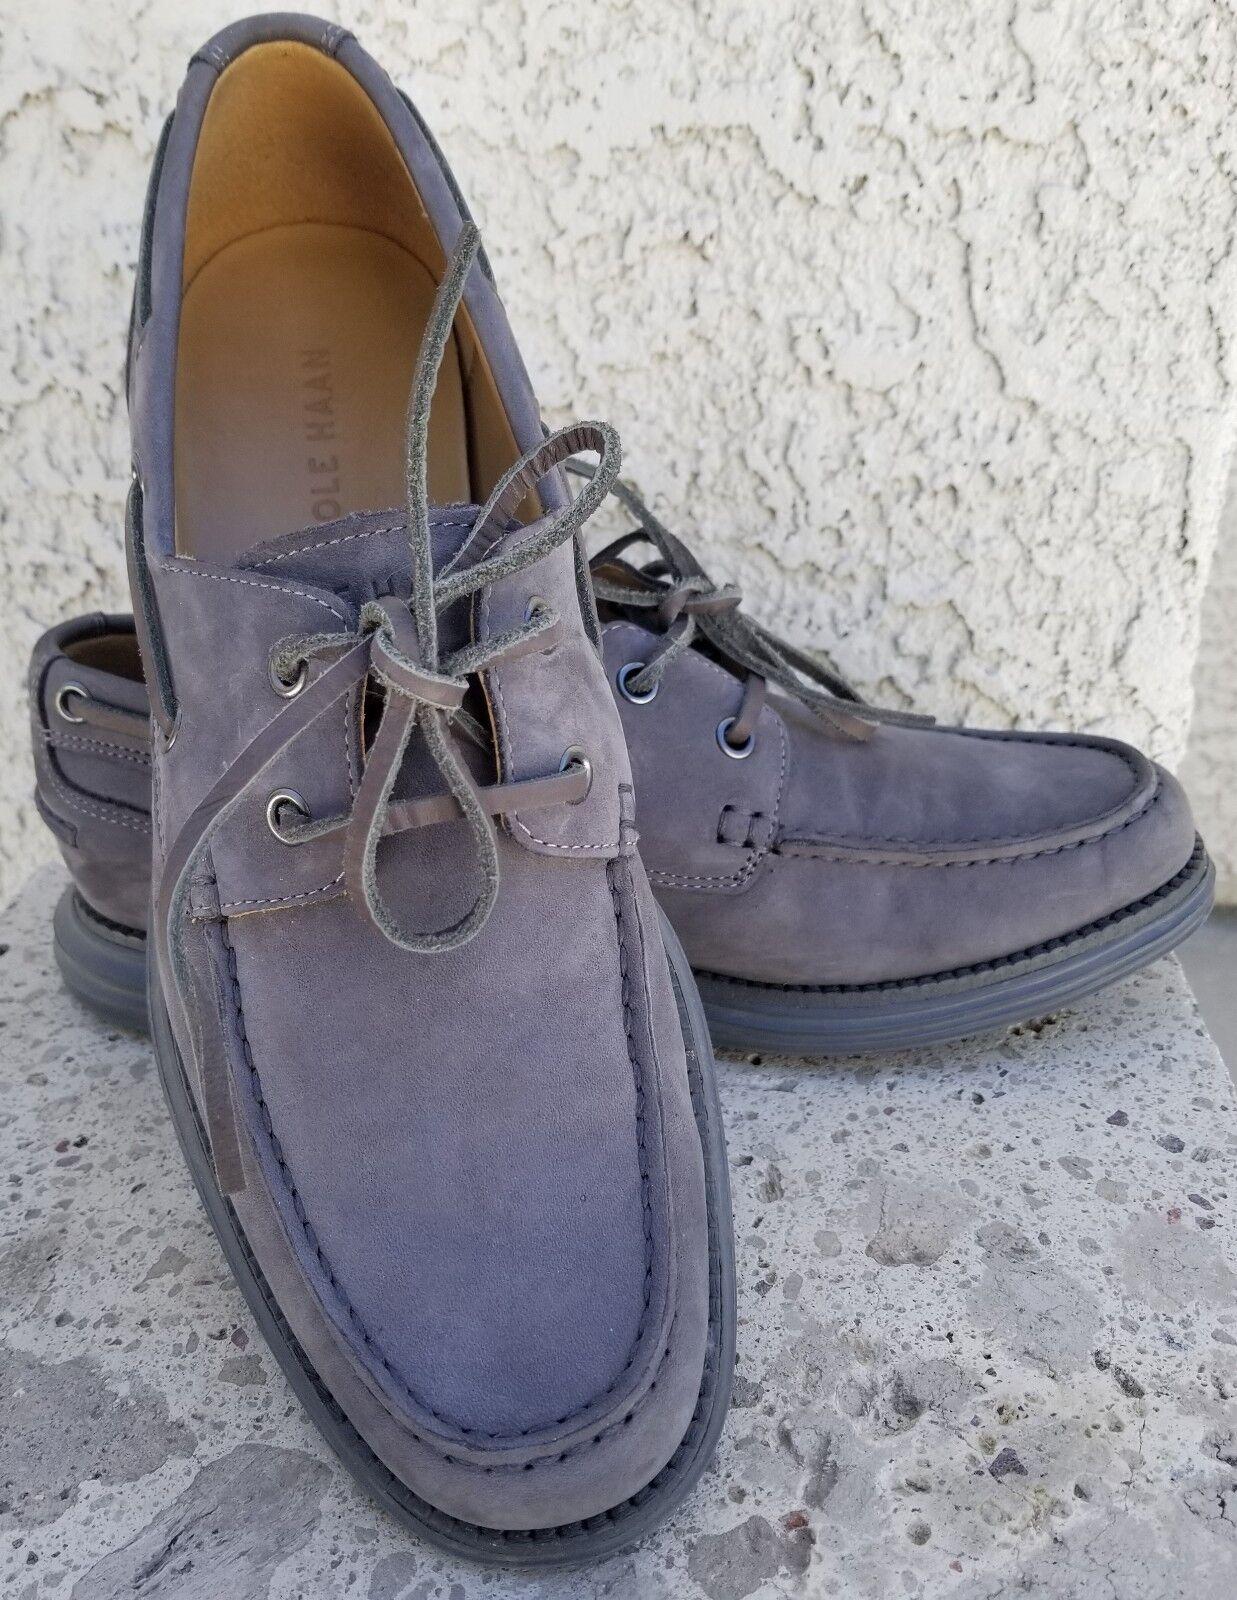 Scarpe casual da uomo Cole Haan uomos Lunargrand Boat Shoe Moc-Toe Lace-Up Casual gray suede Size 8 M